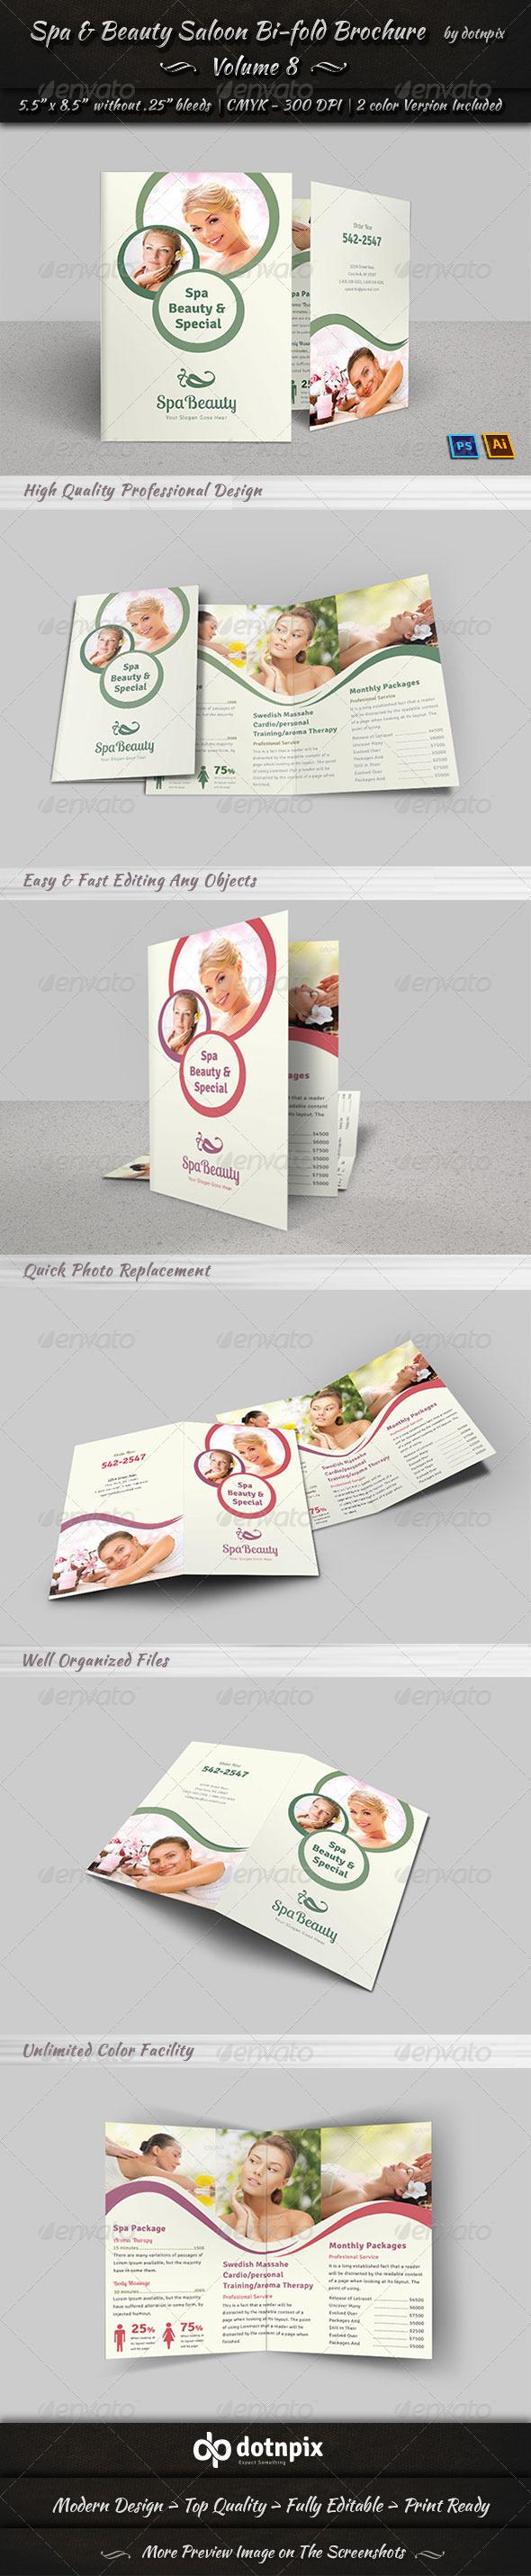 GraphicRiver Spa & Beauty Saloon Bi-fold Brochure Volume 8 7888174